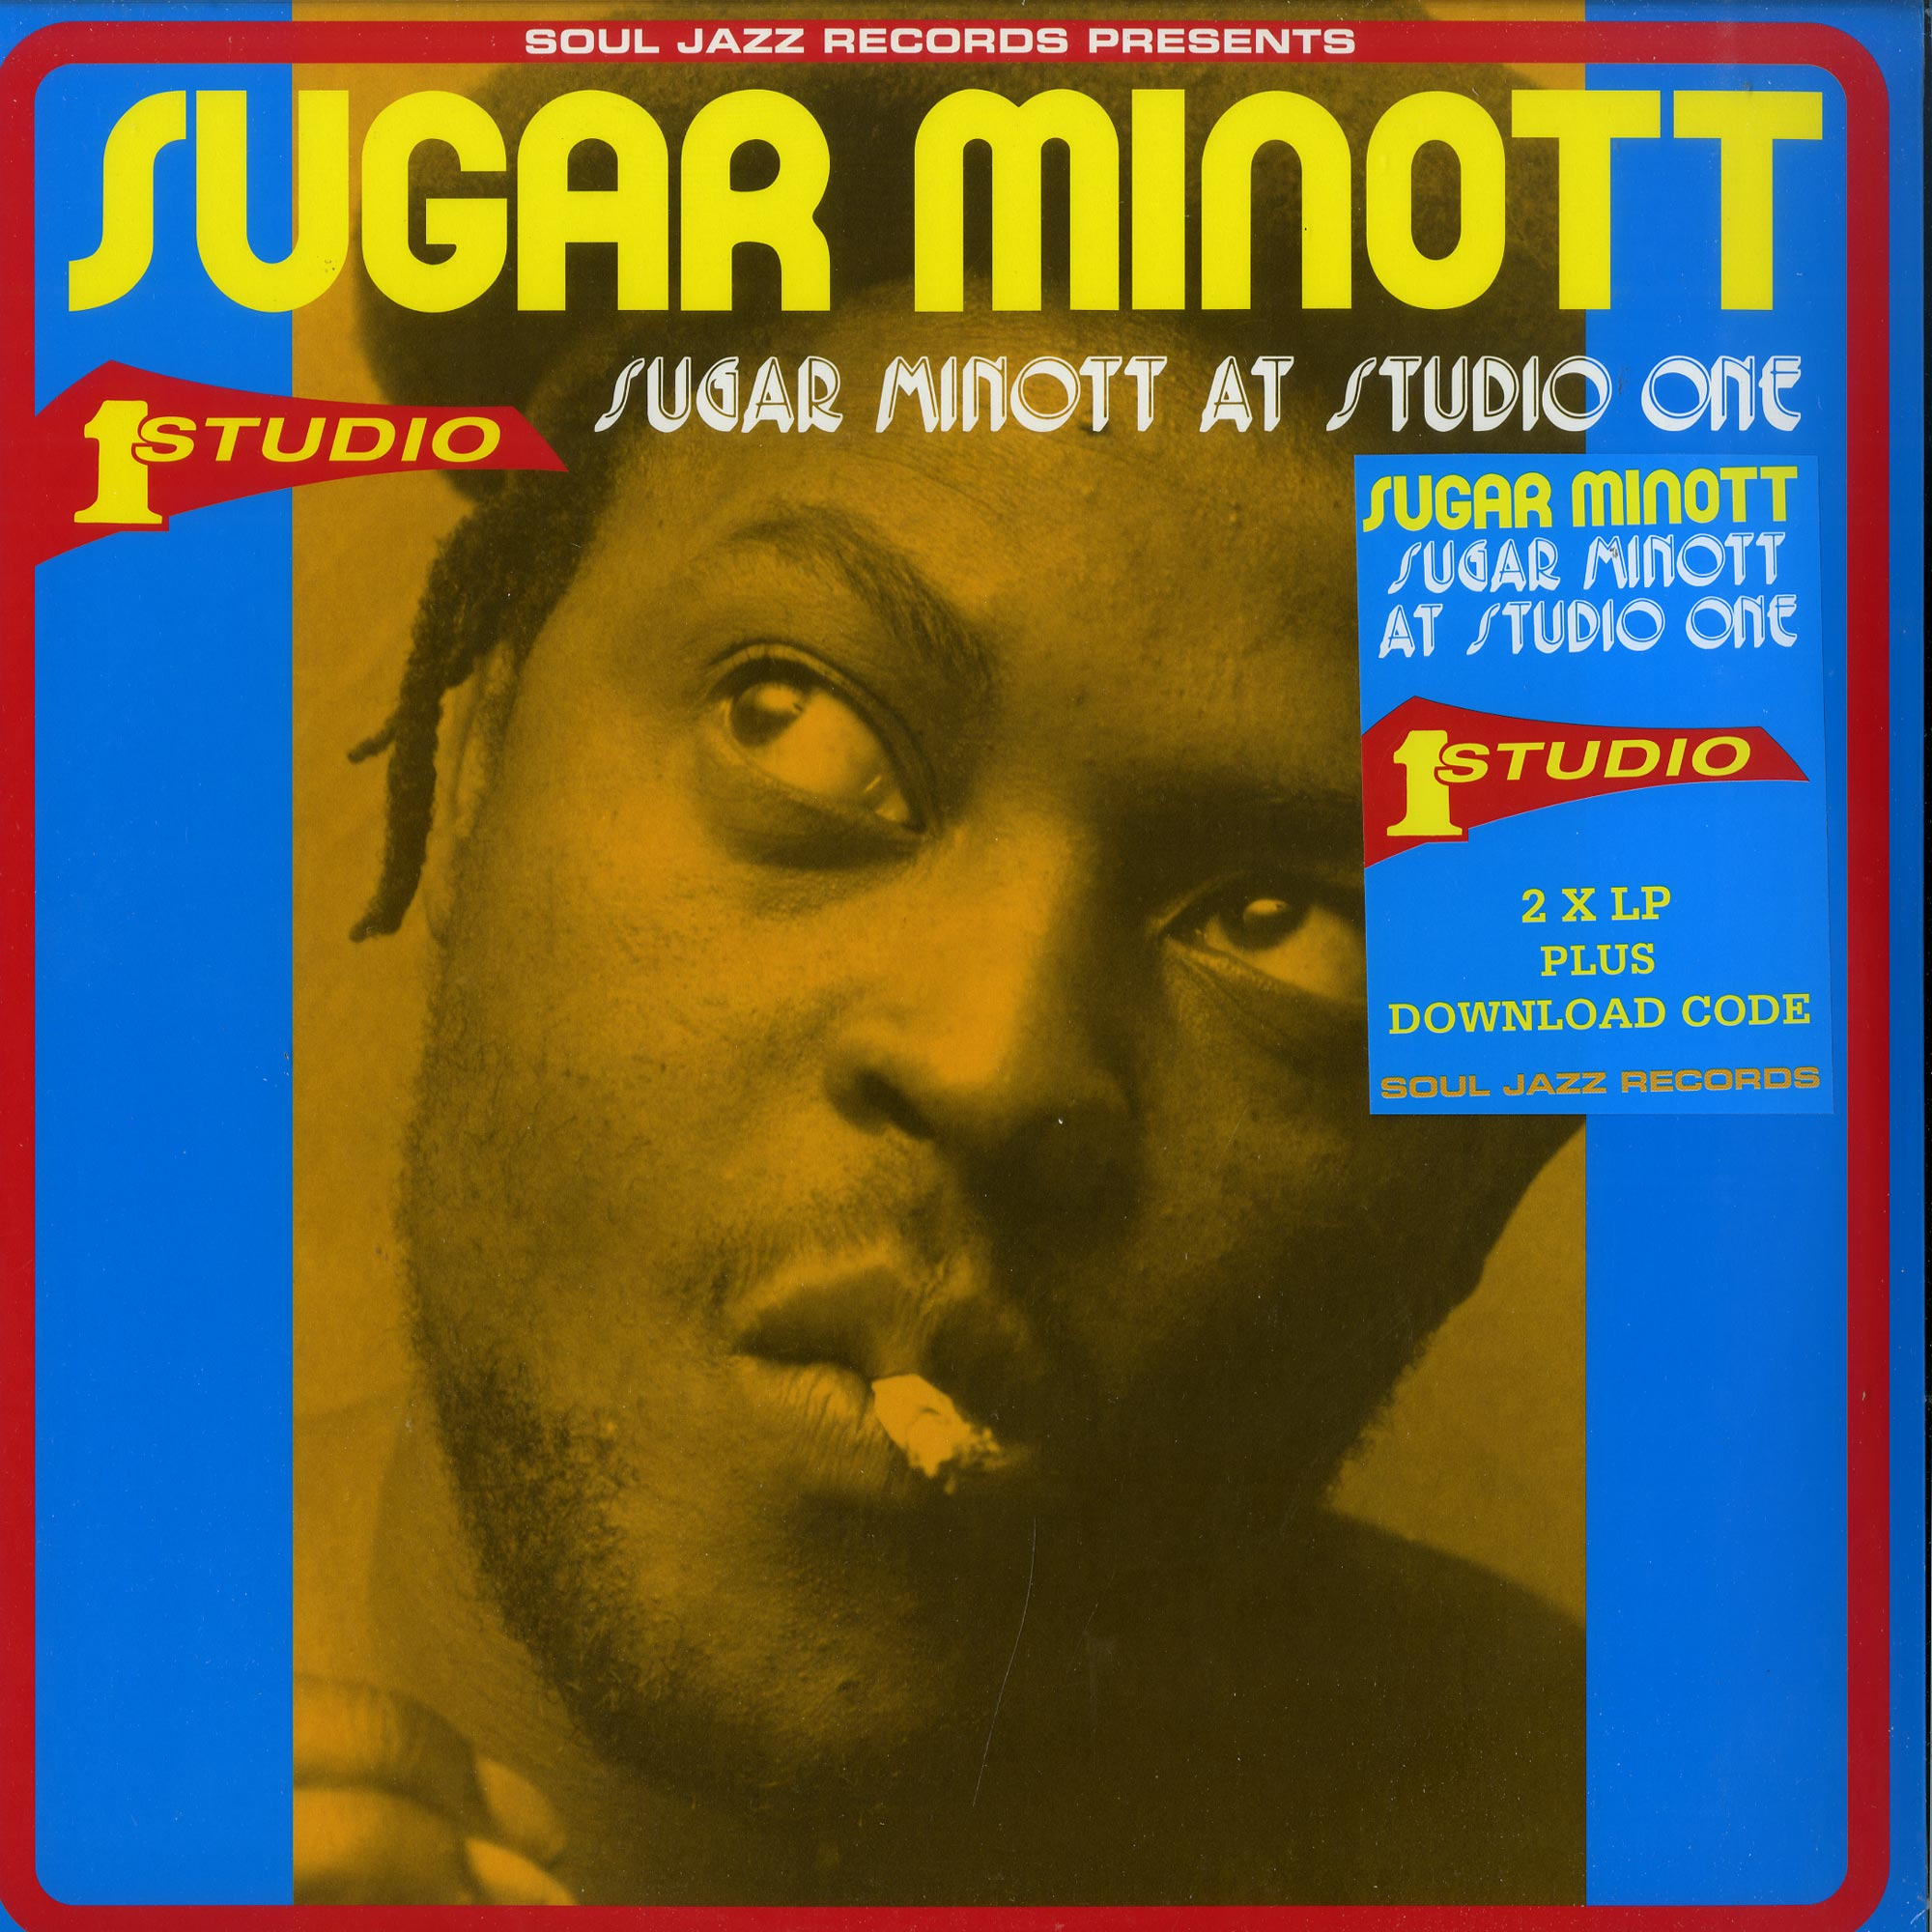 Sugar Minott - SUGAR MINOTT AT STUDIO ONE